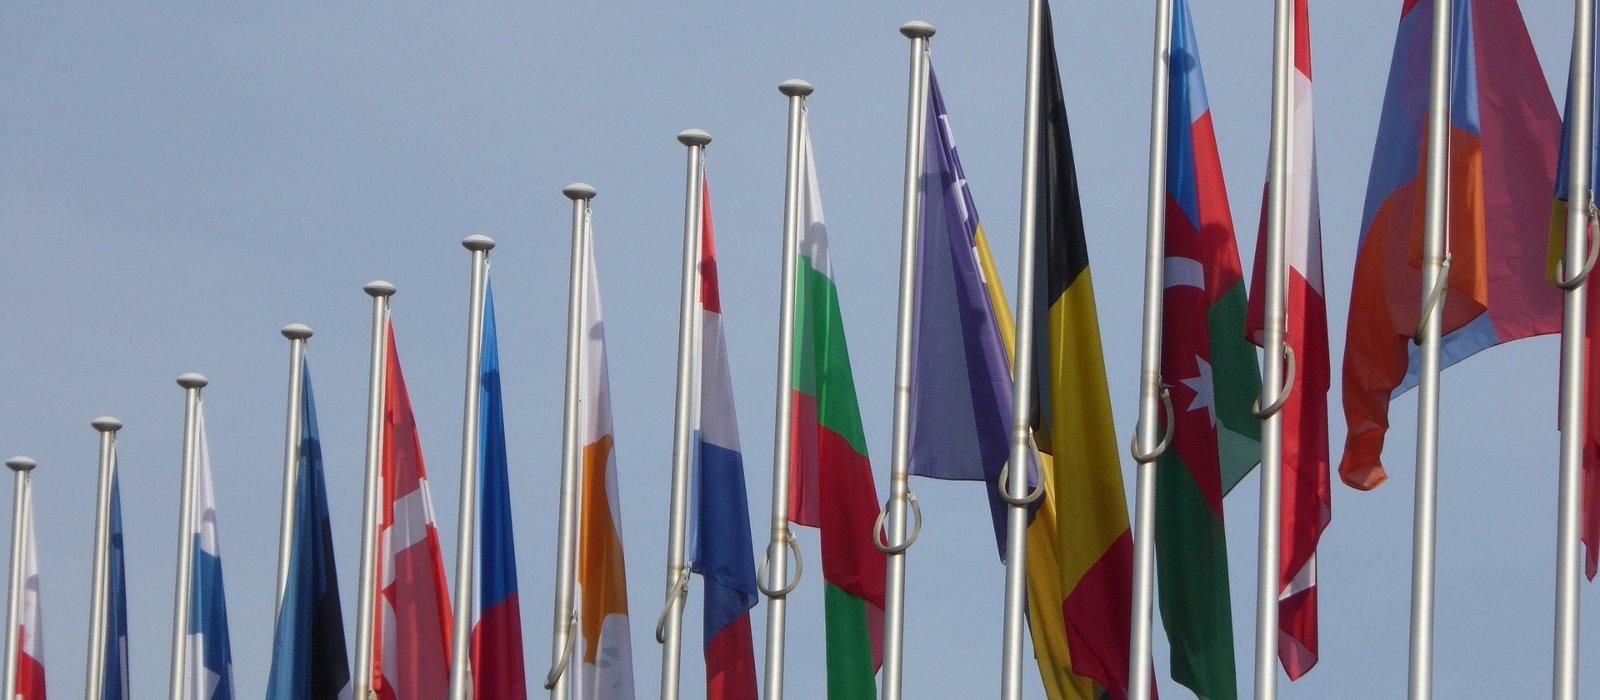 Organisation incentive en Alsace